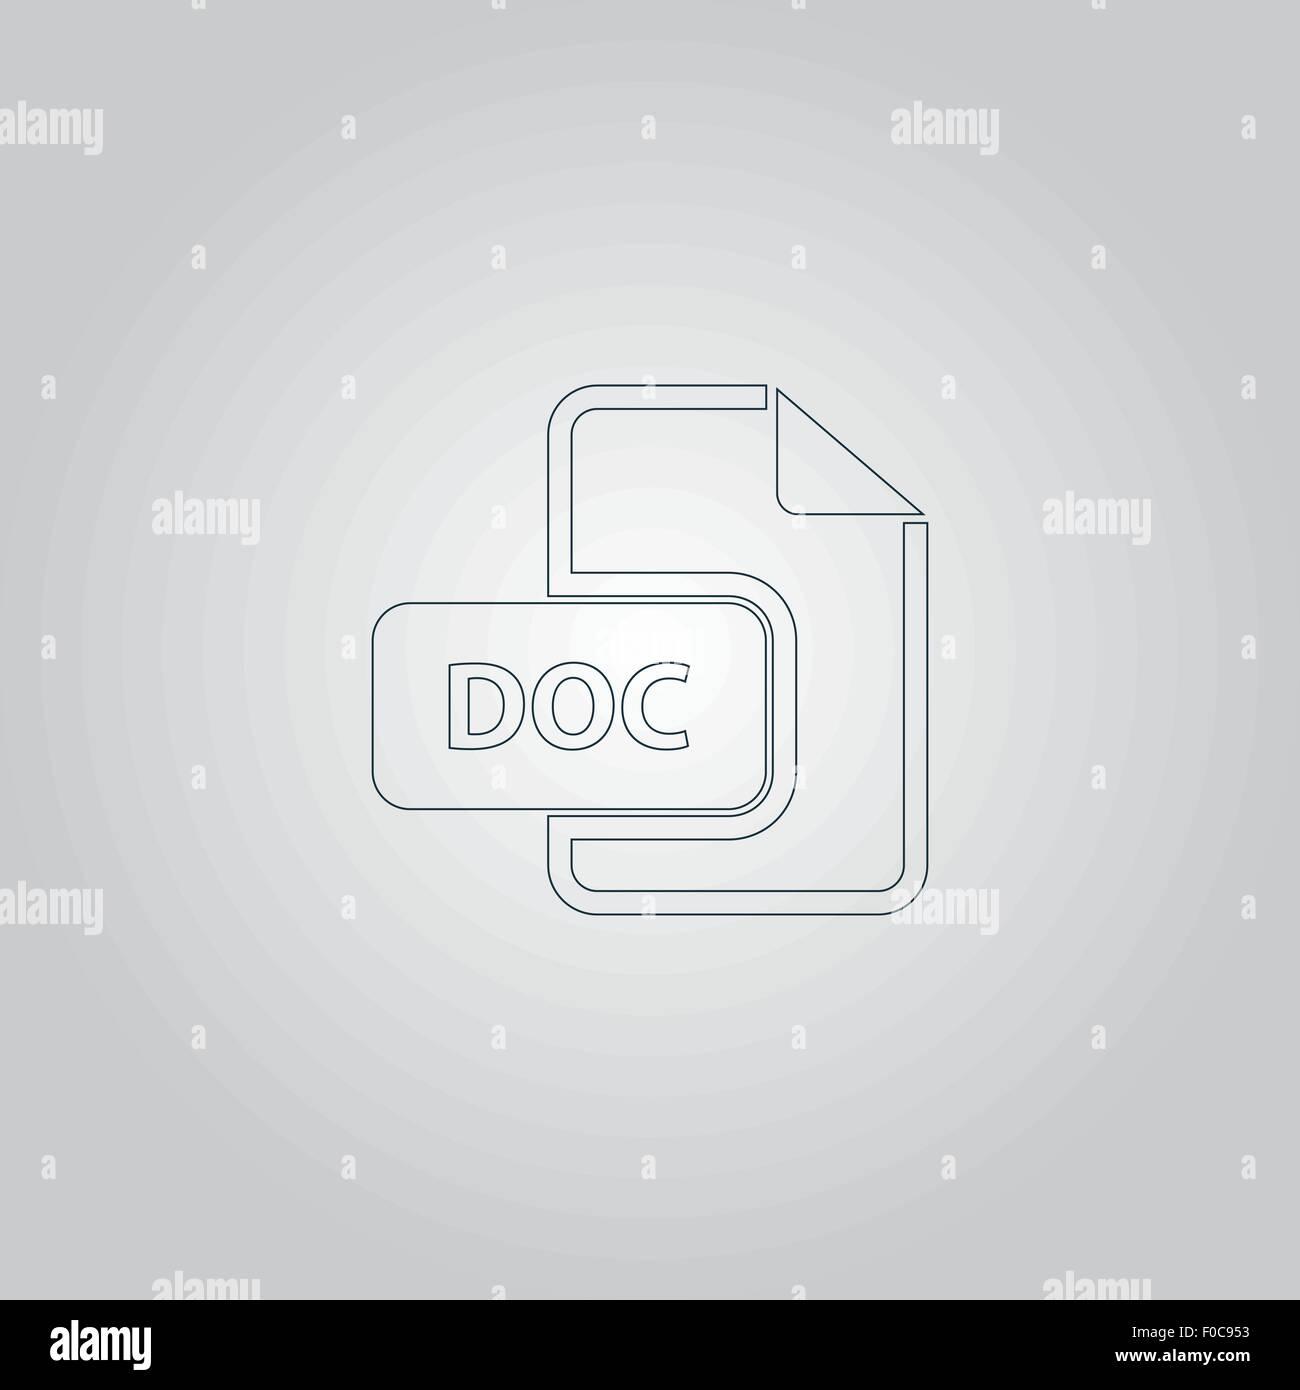 doc vector file extension icon stock vector art illustration